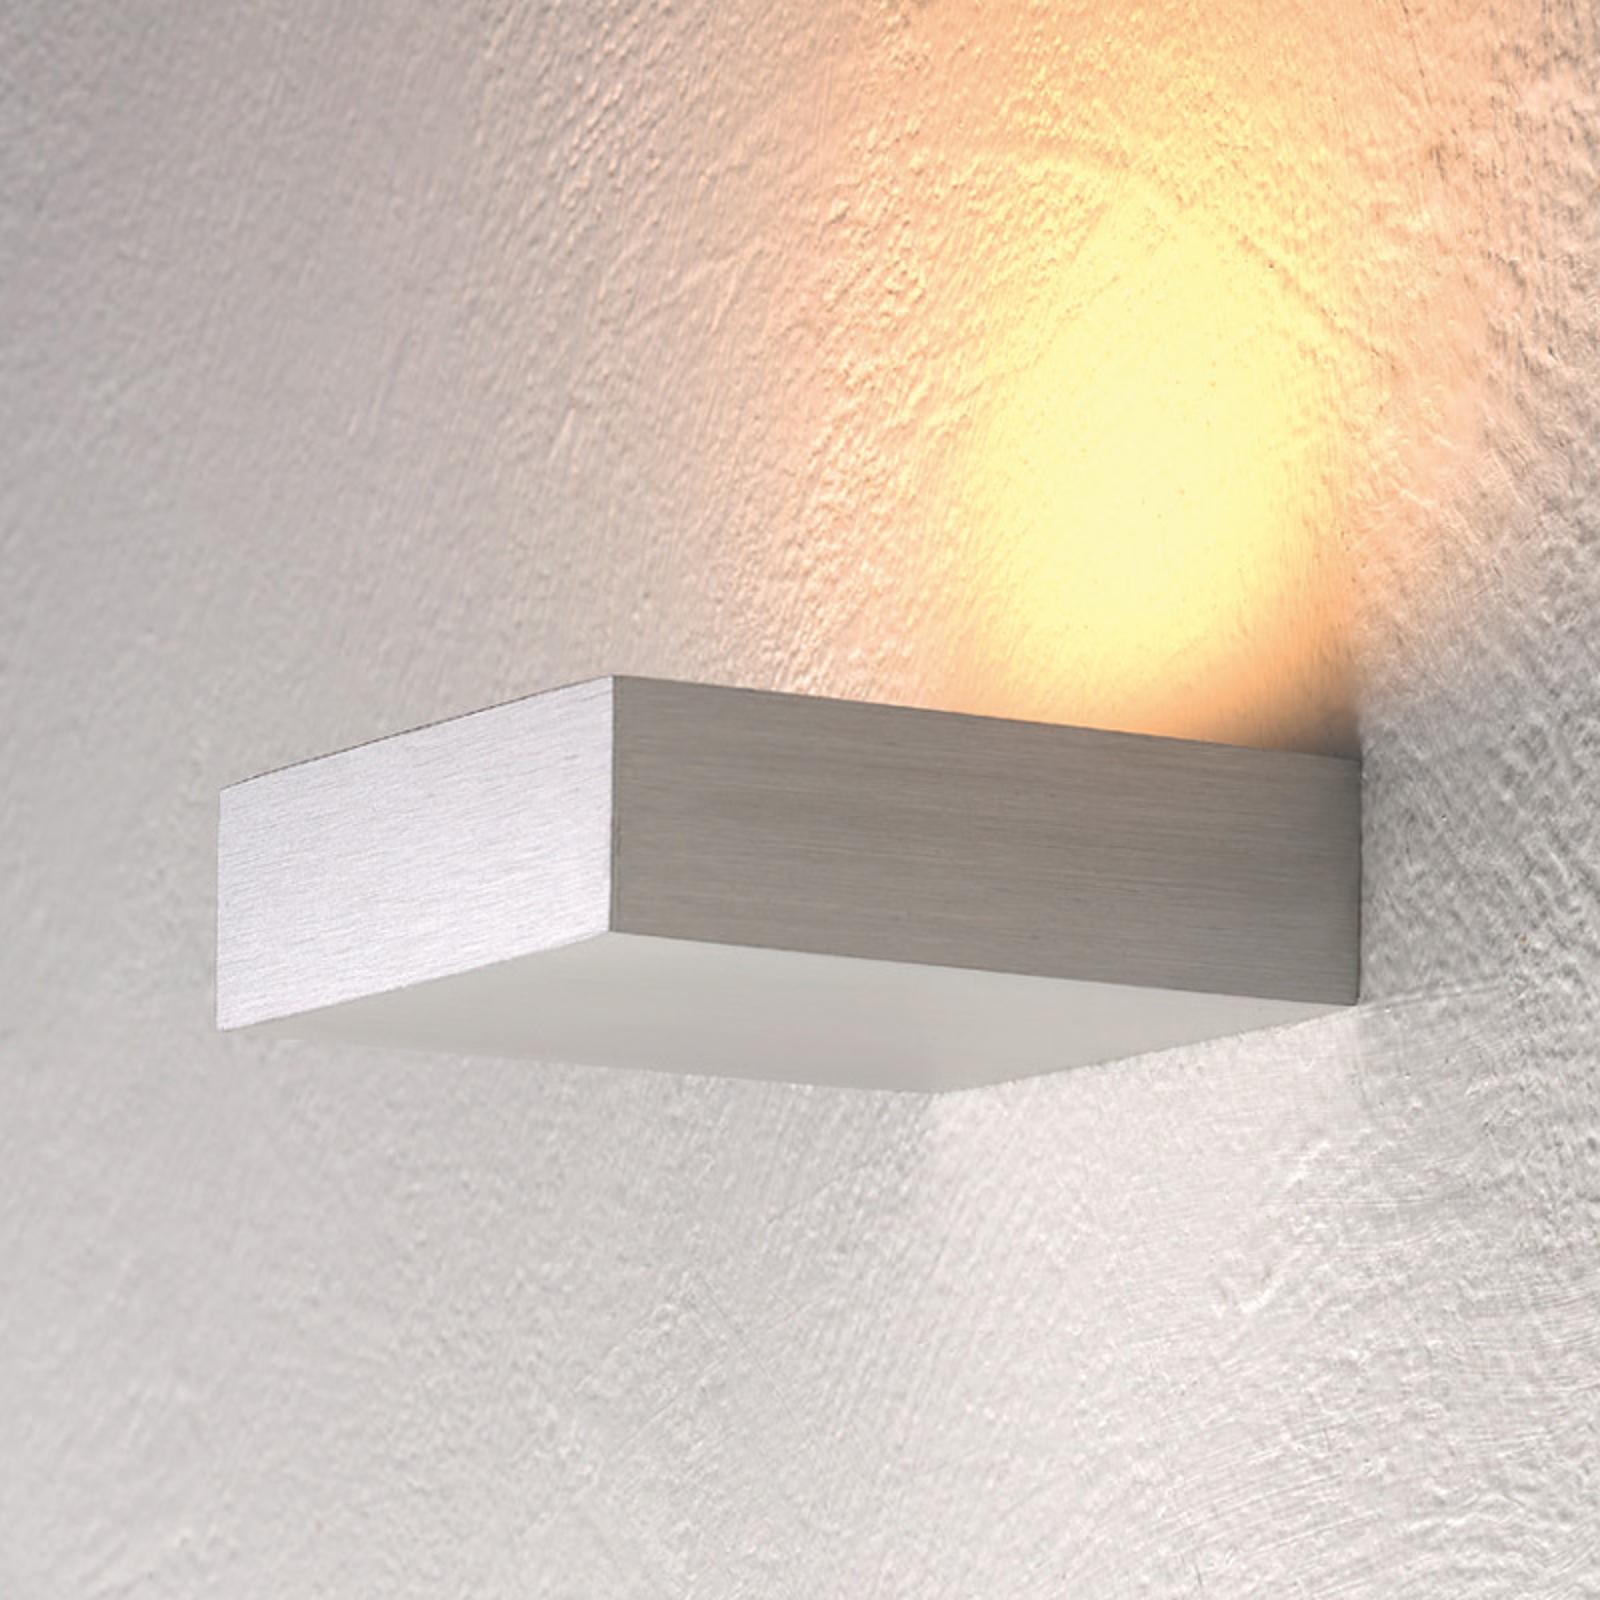 Bopp Cubus – decentné nástenné LED svietidlo_1556049_1